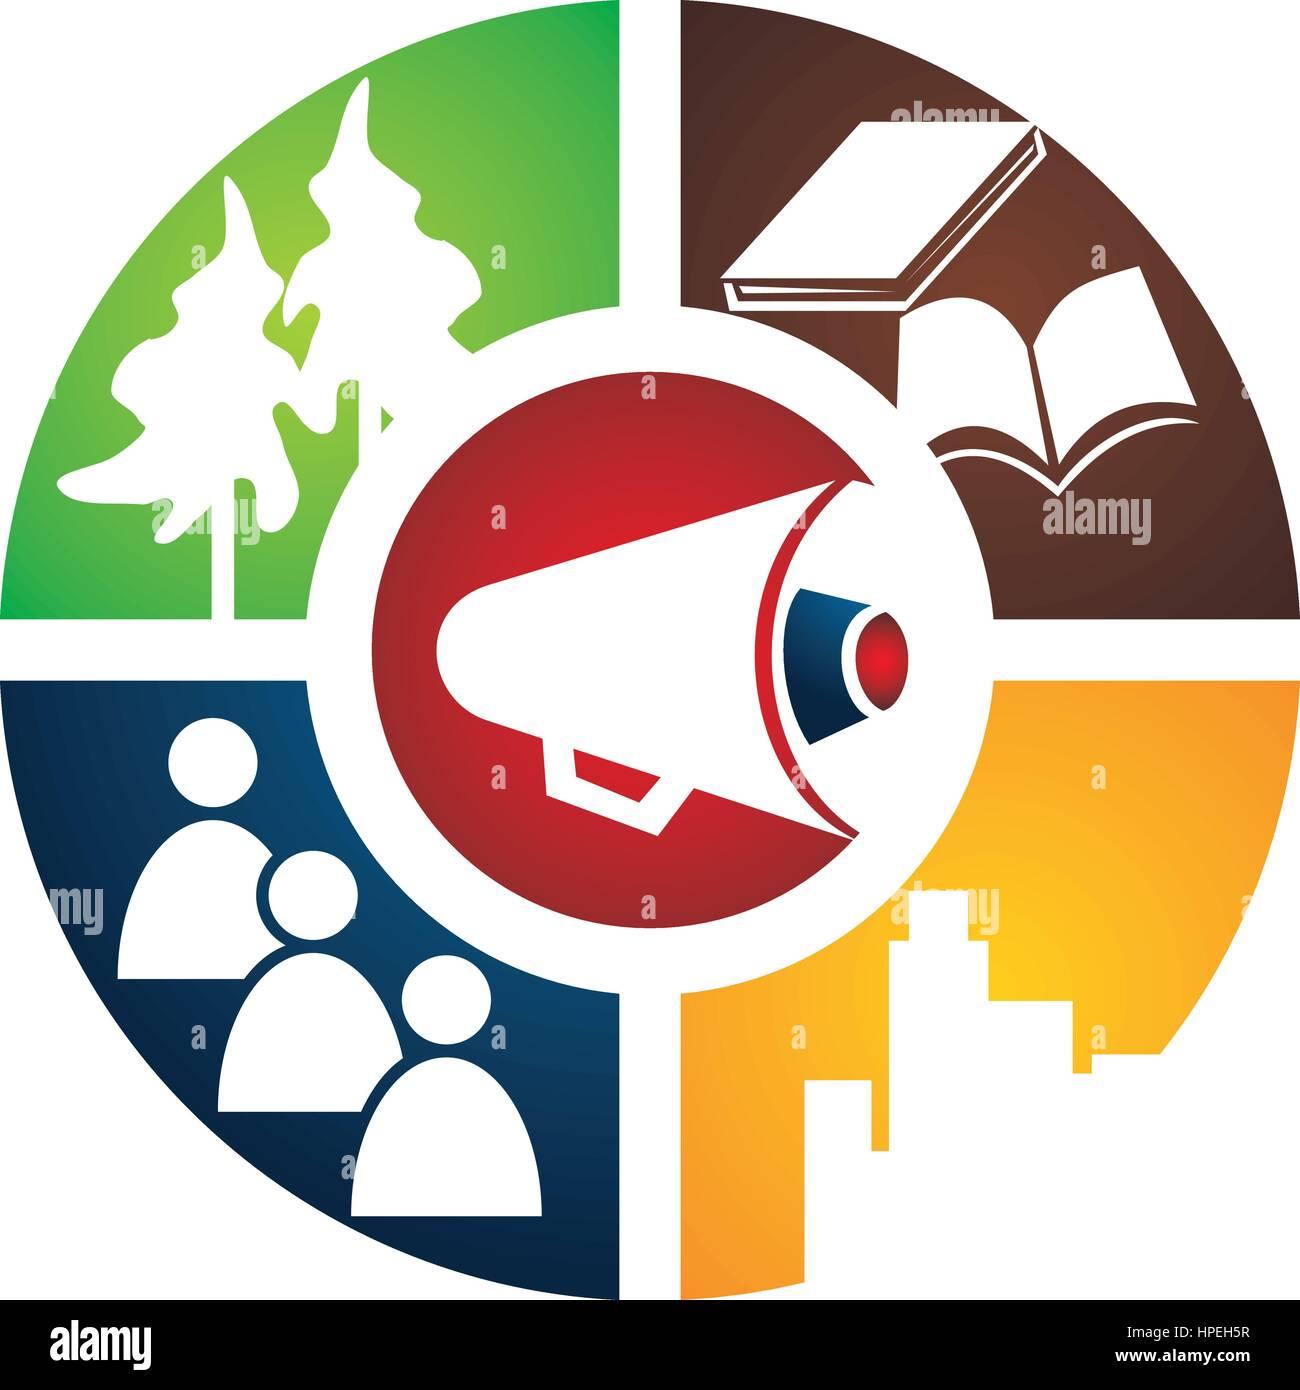 Student City Voice Logo - Stock Image